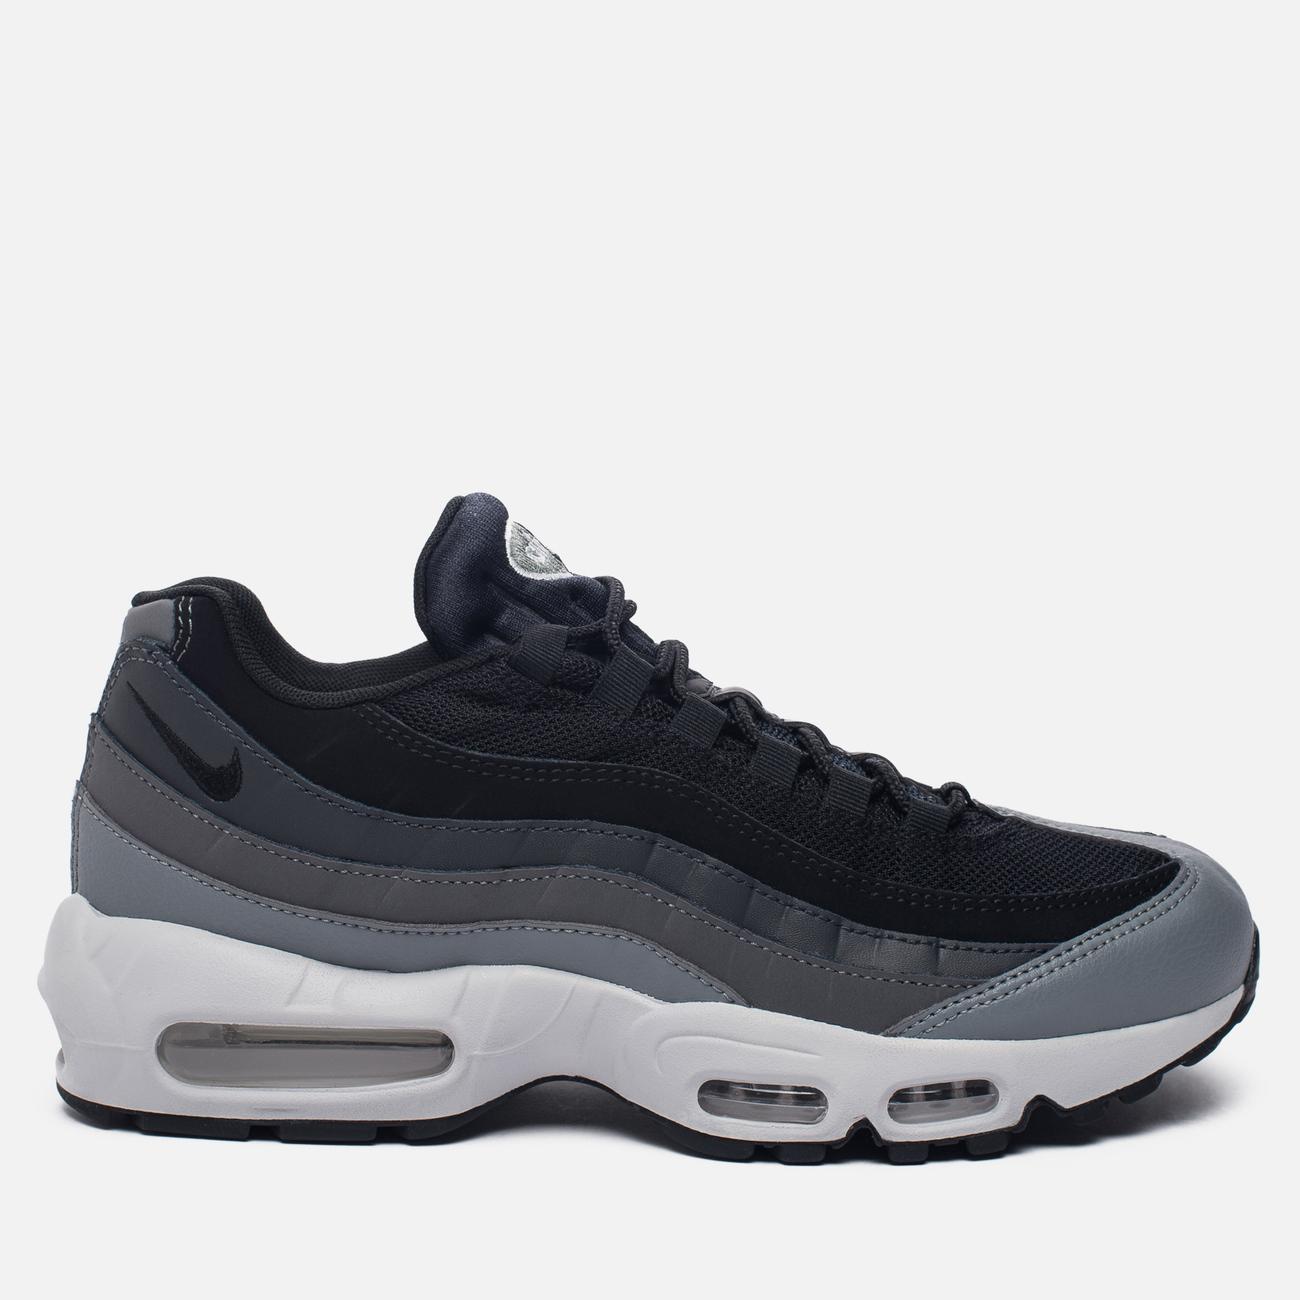 Мужские кроссовки Nike Air Max 95 Essential 749766 021